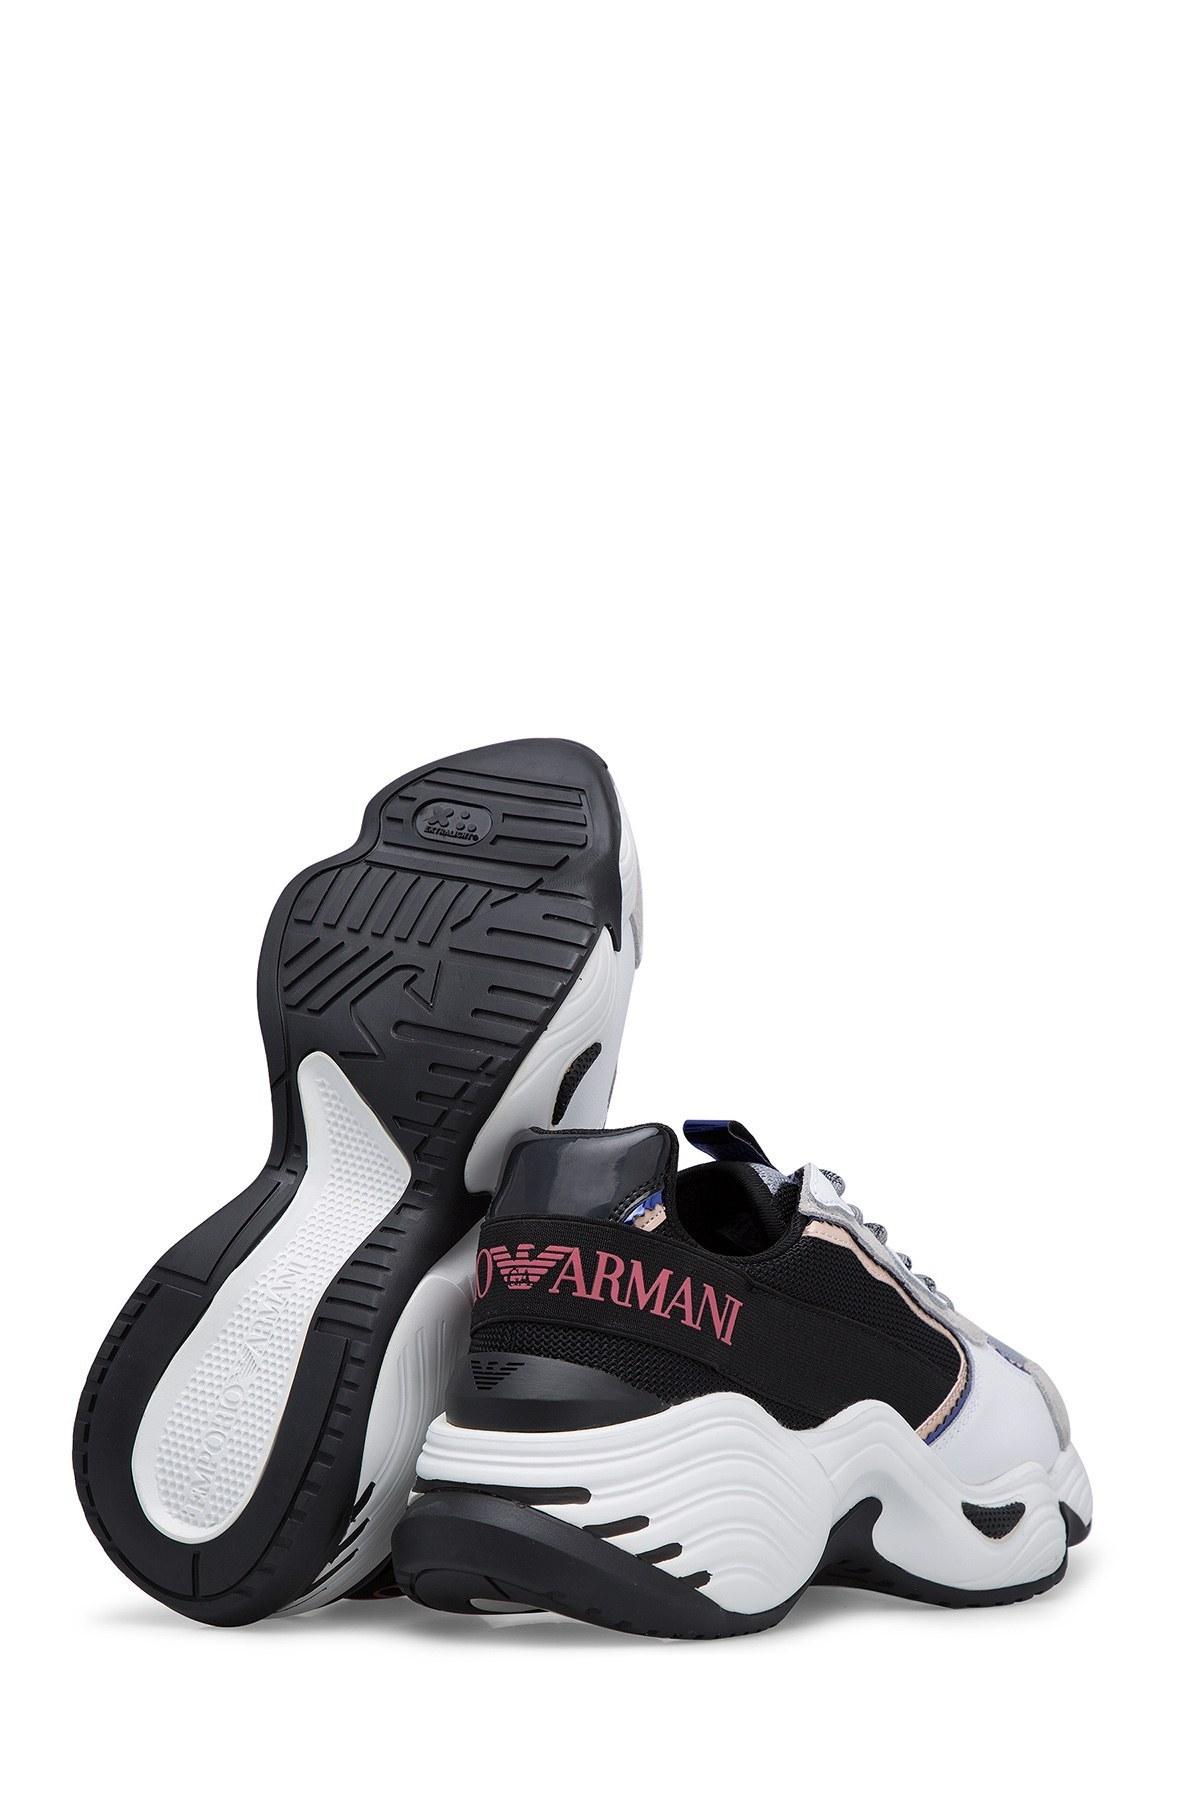 Emporio Armani Kadın Ayakkabı S X3X088 XM059 R539 BEYAZ